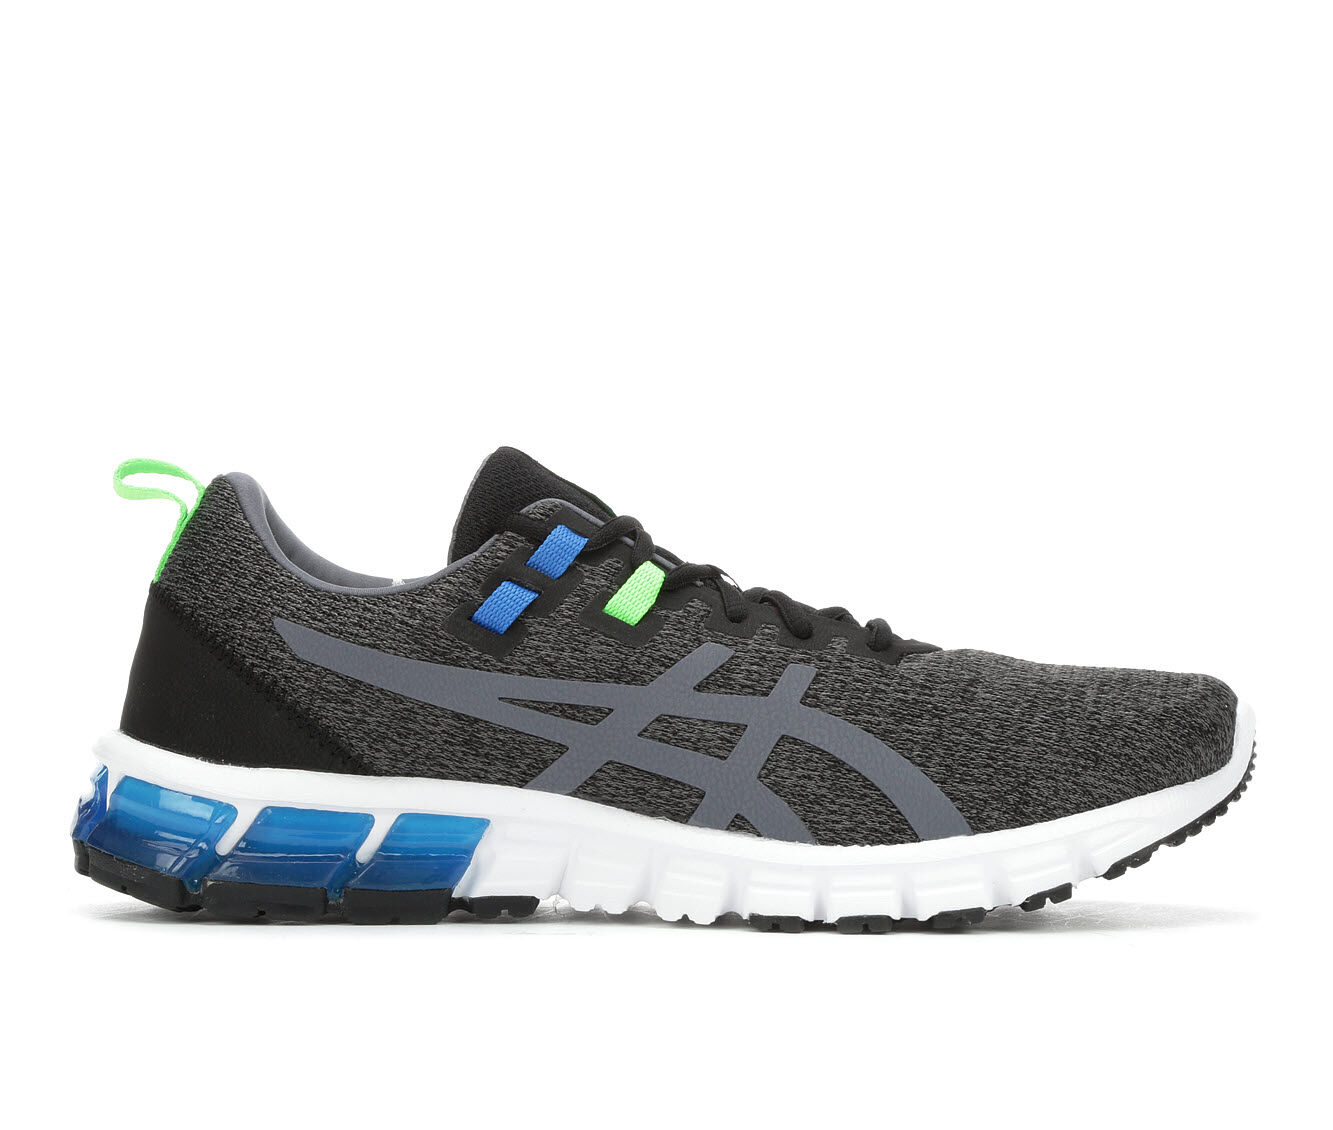 Men's ASICS Gel Quantum 90 Running Shoes Gry/Blu/Grn